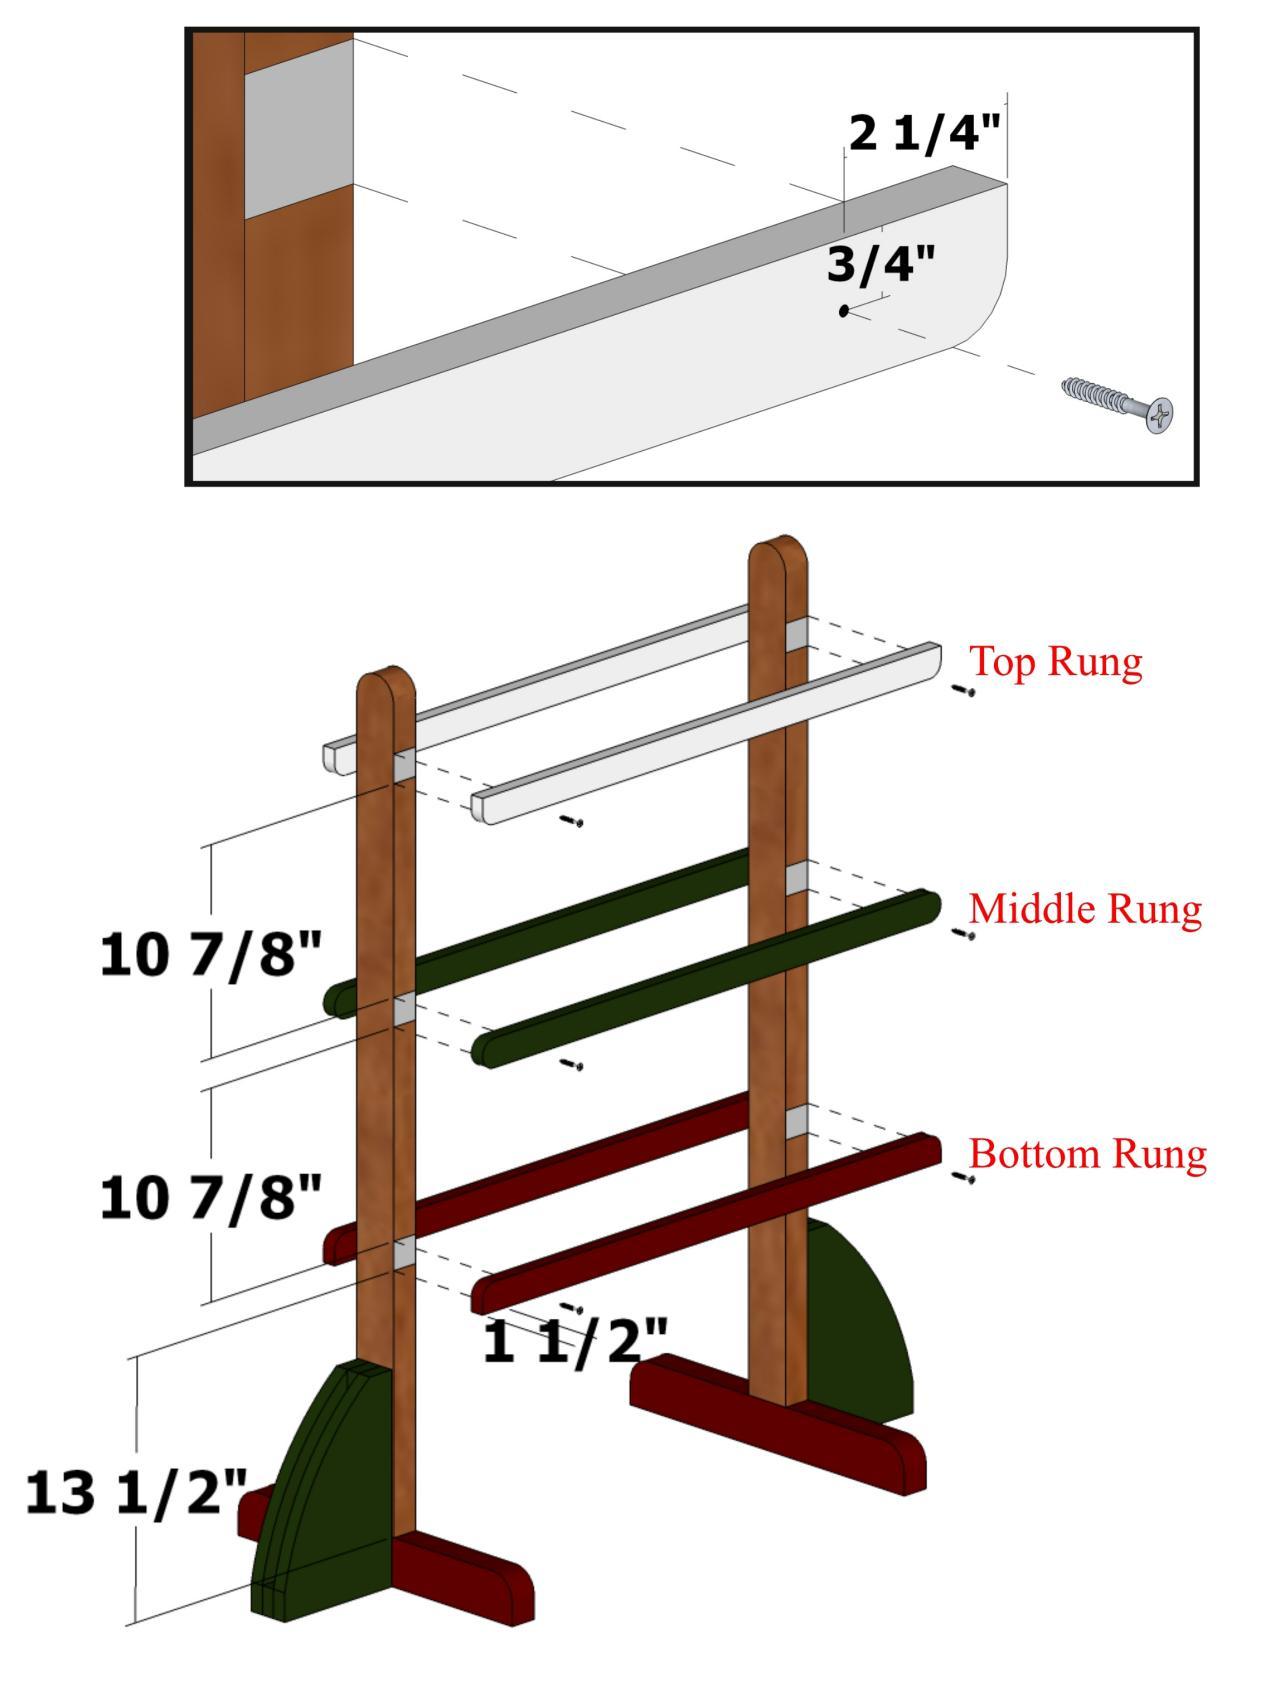 Ladder golf rungs layout photos diy for Chair network golf